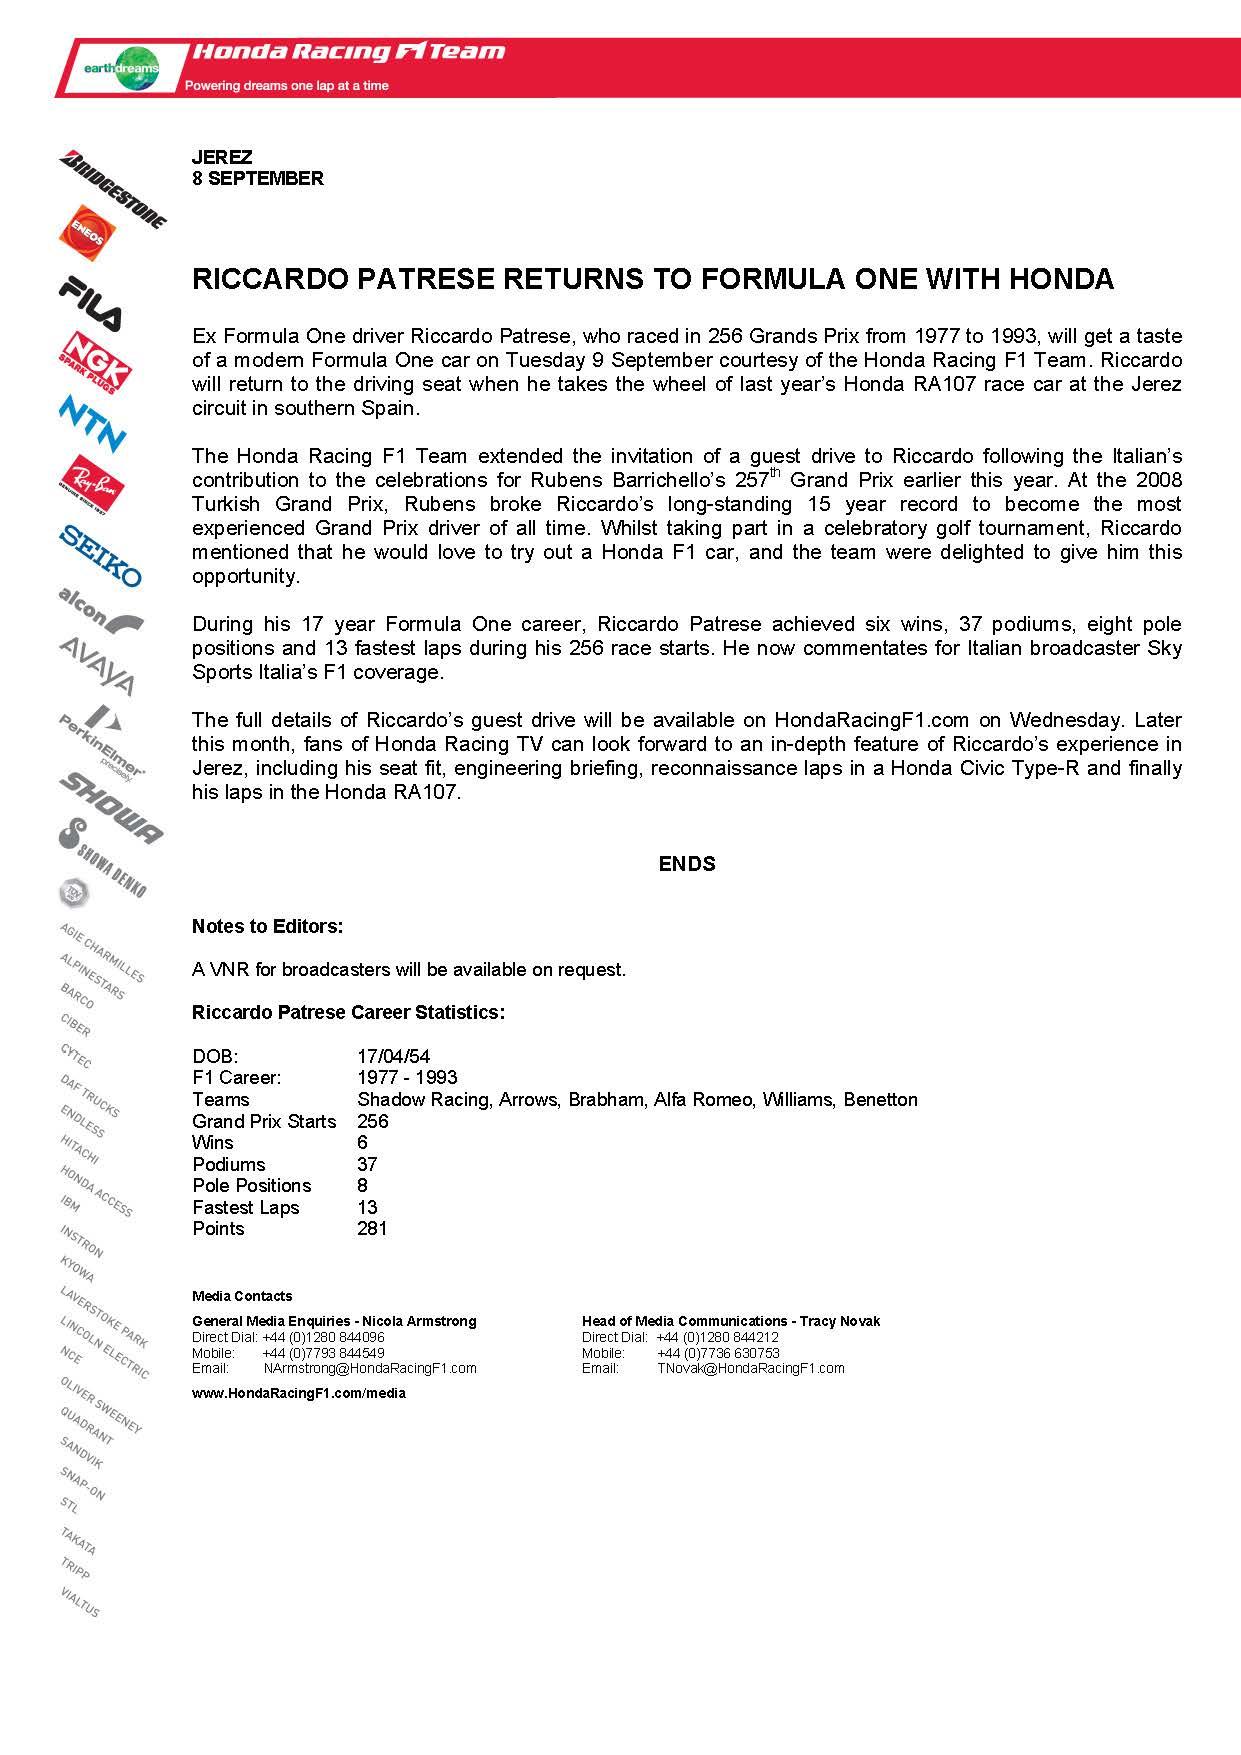 Riccardo Patrese Returns To Formula One With Honda.jpg